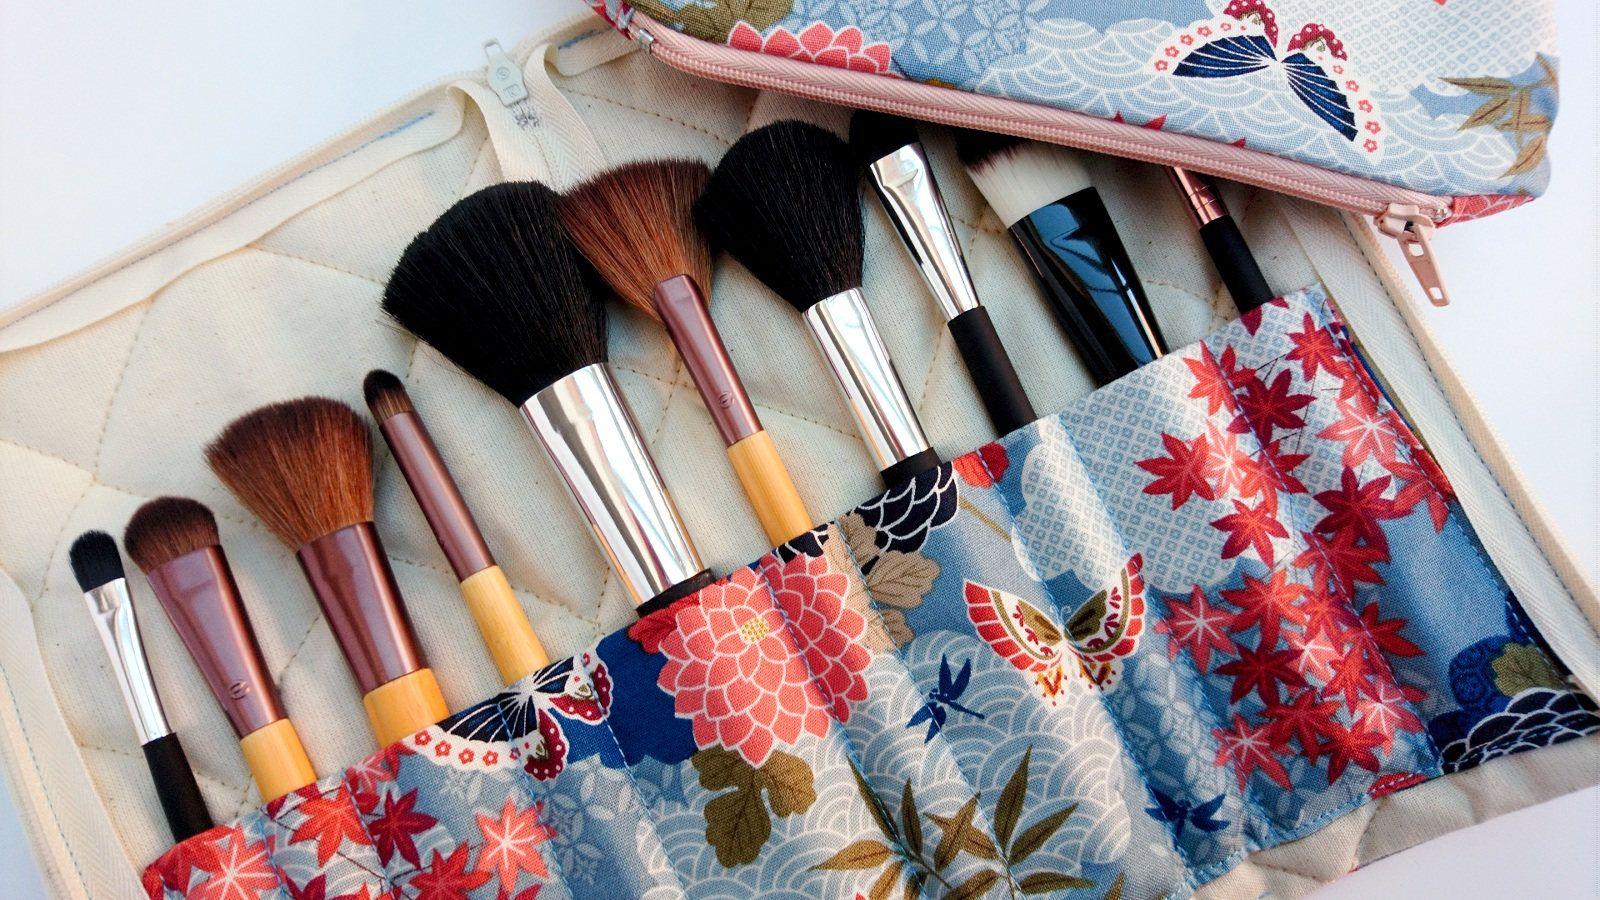 Fabric makeup brush holder and bag, makeup brush organiser